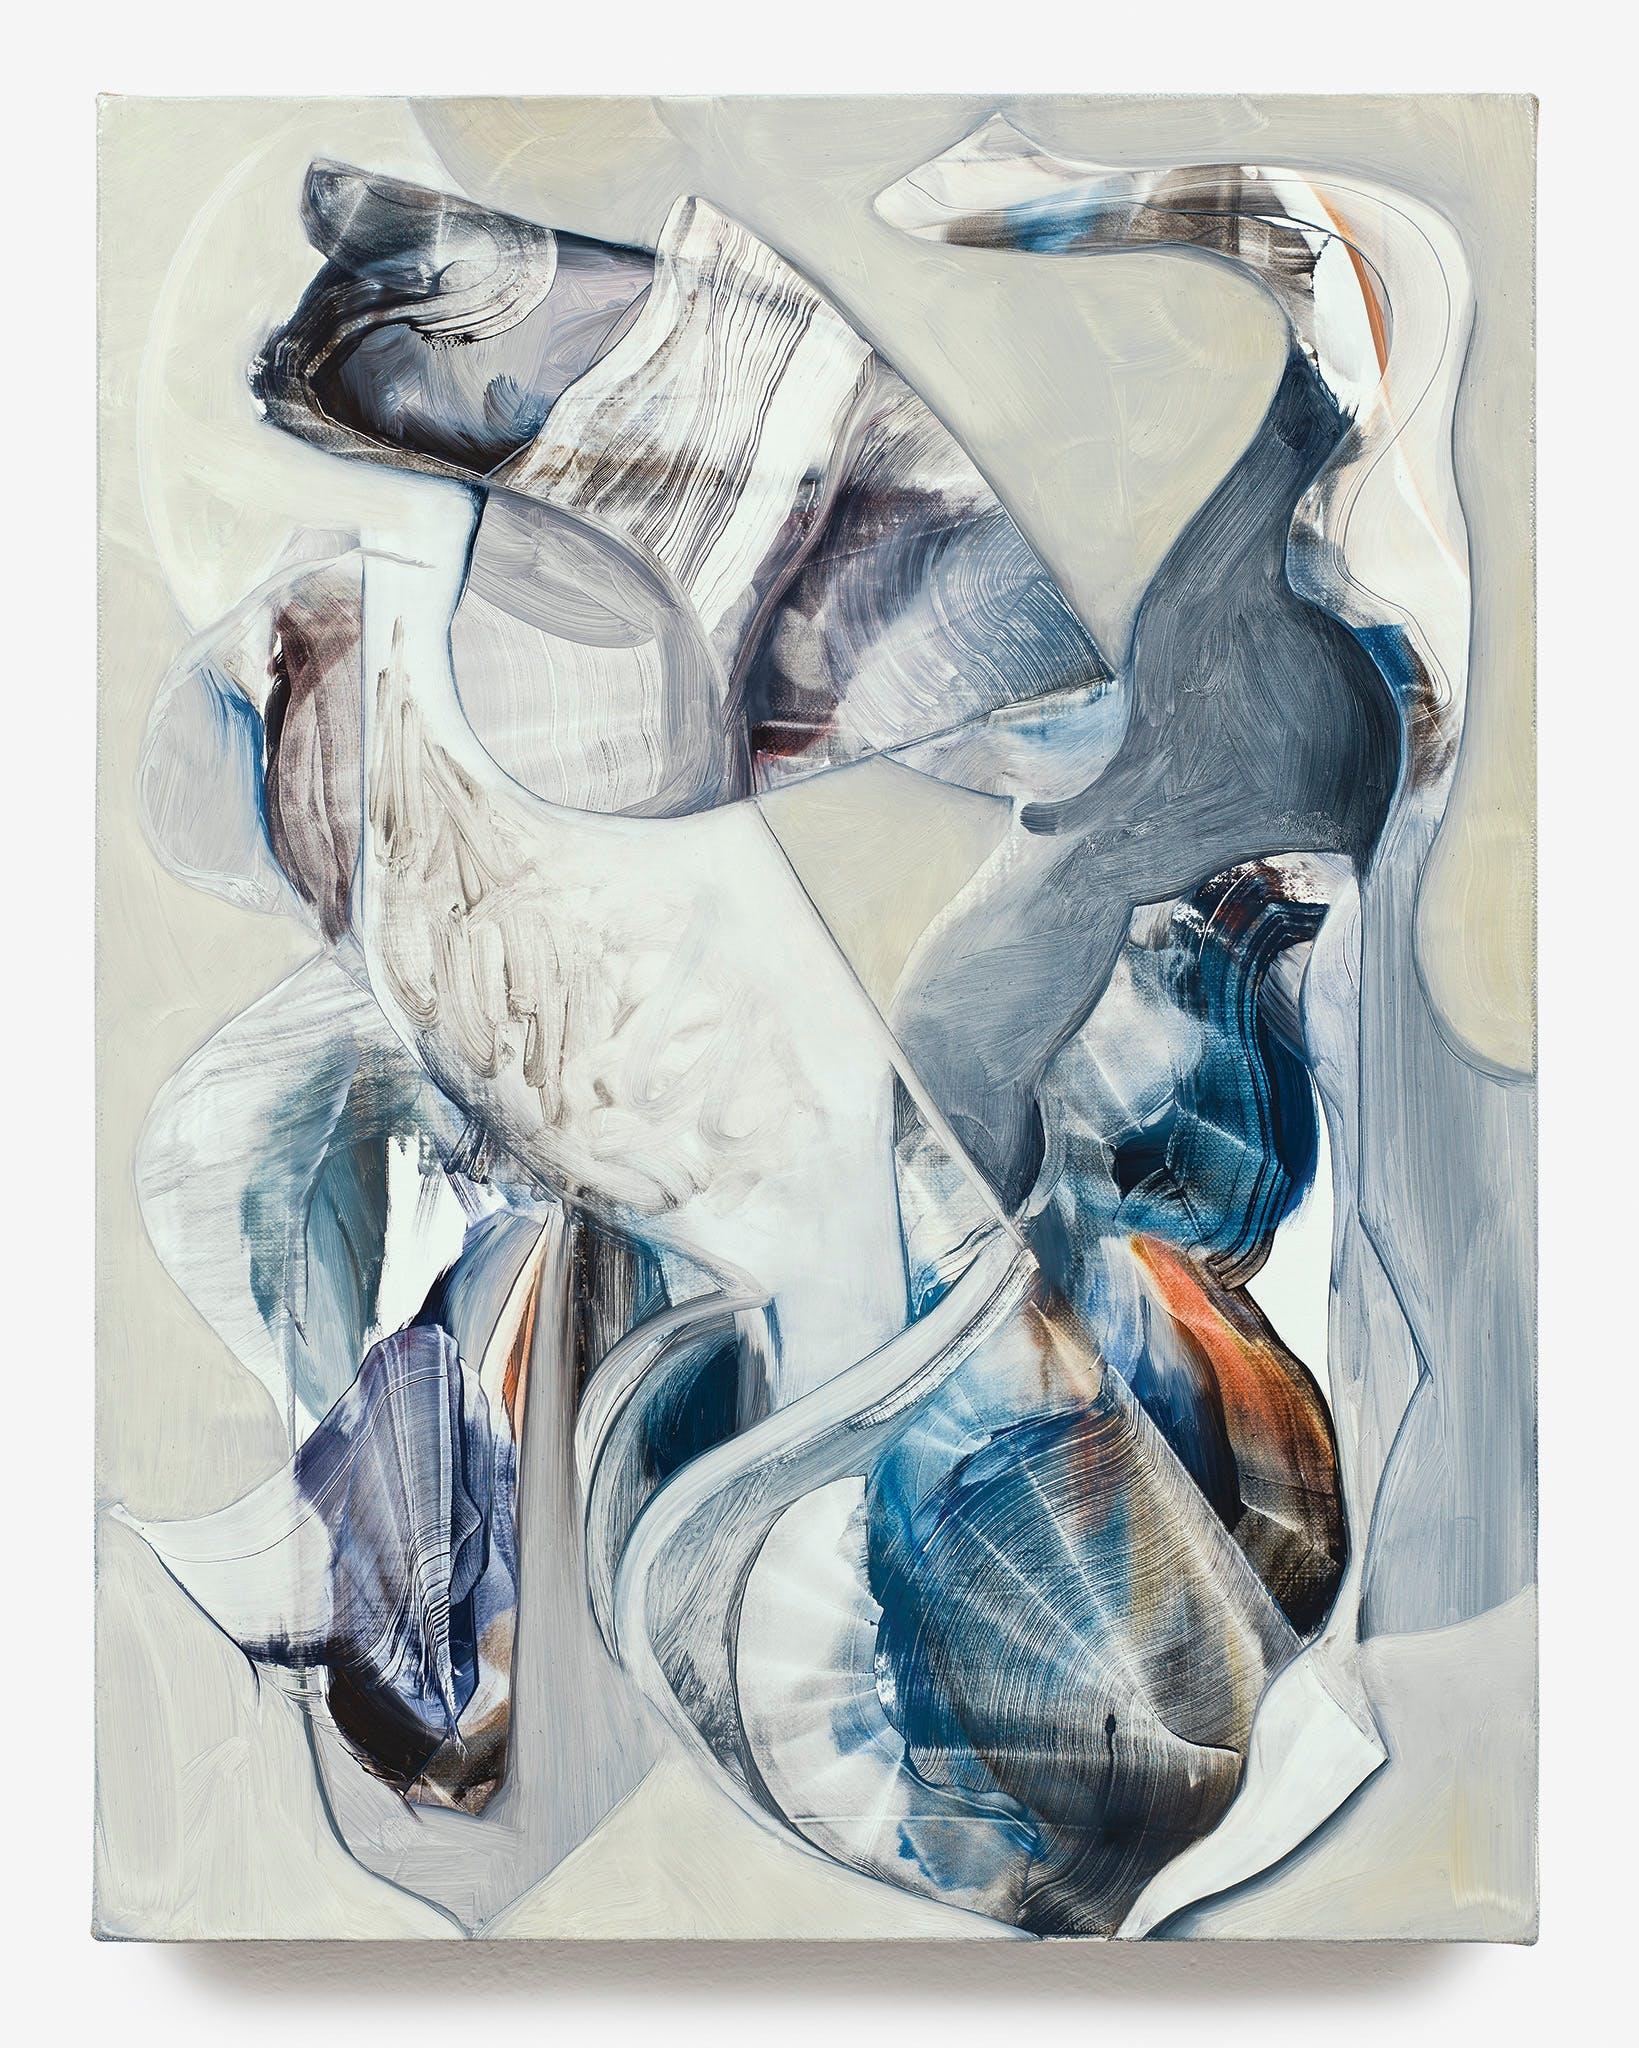 Lesley Vance, Untitled, 2012